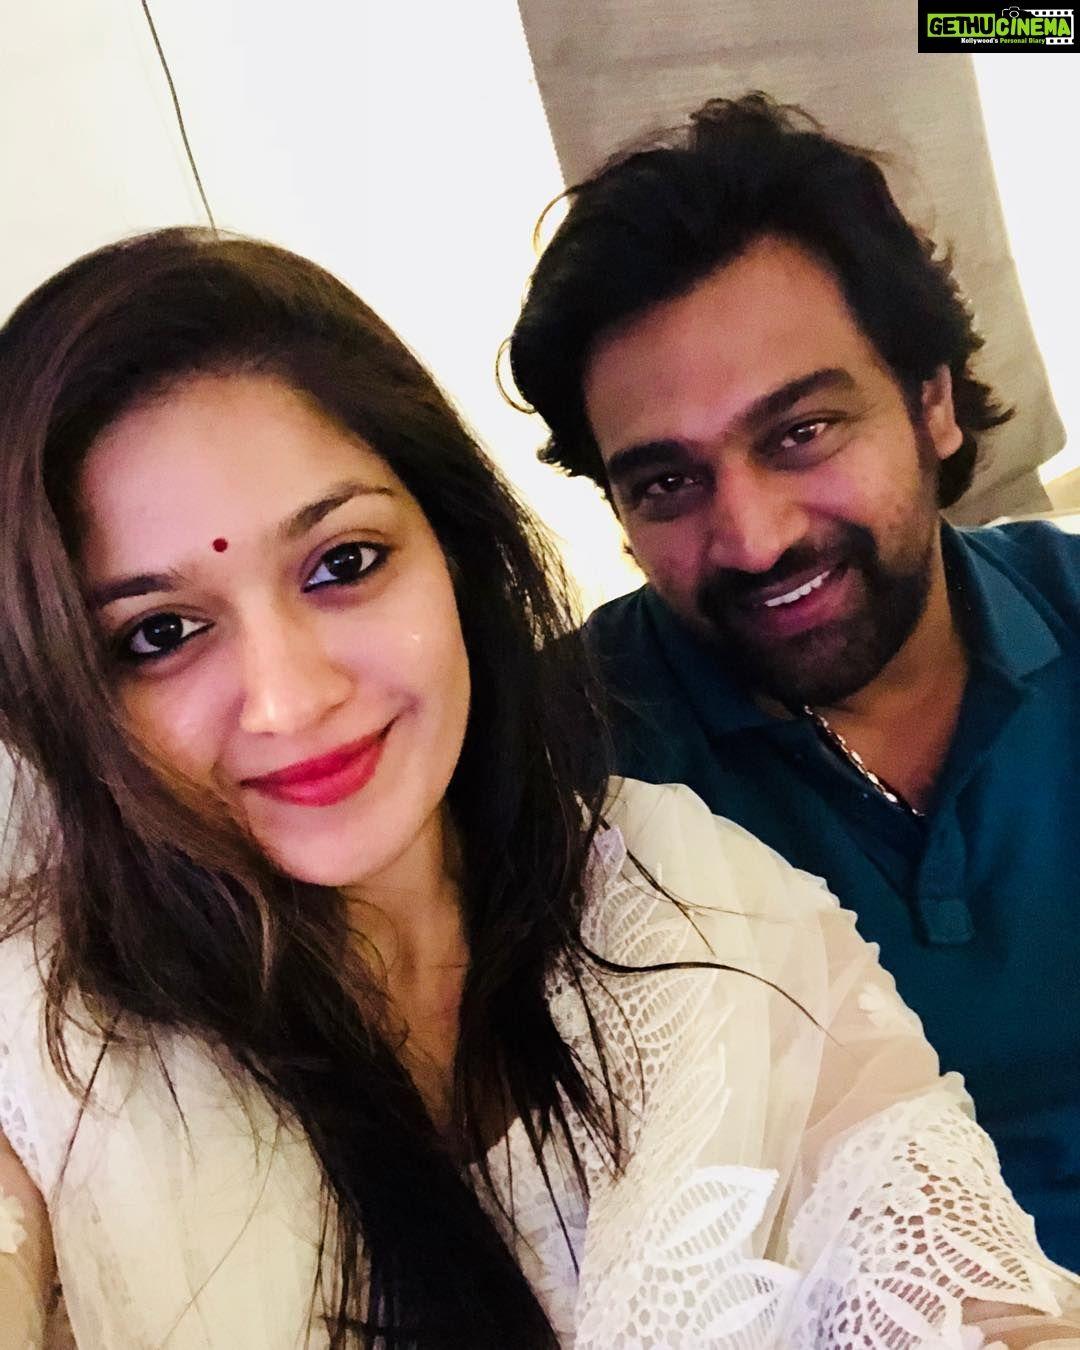 Actress Meghana Raj 2019 Pretty Latest Hd Stills Gethu Cinema Hd Wallpapers For Mobile Hd Photos Actresses